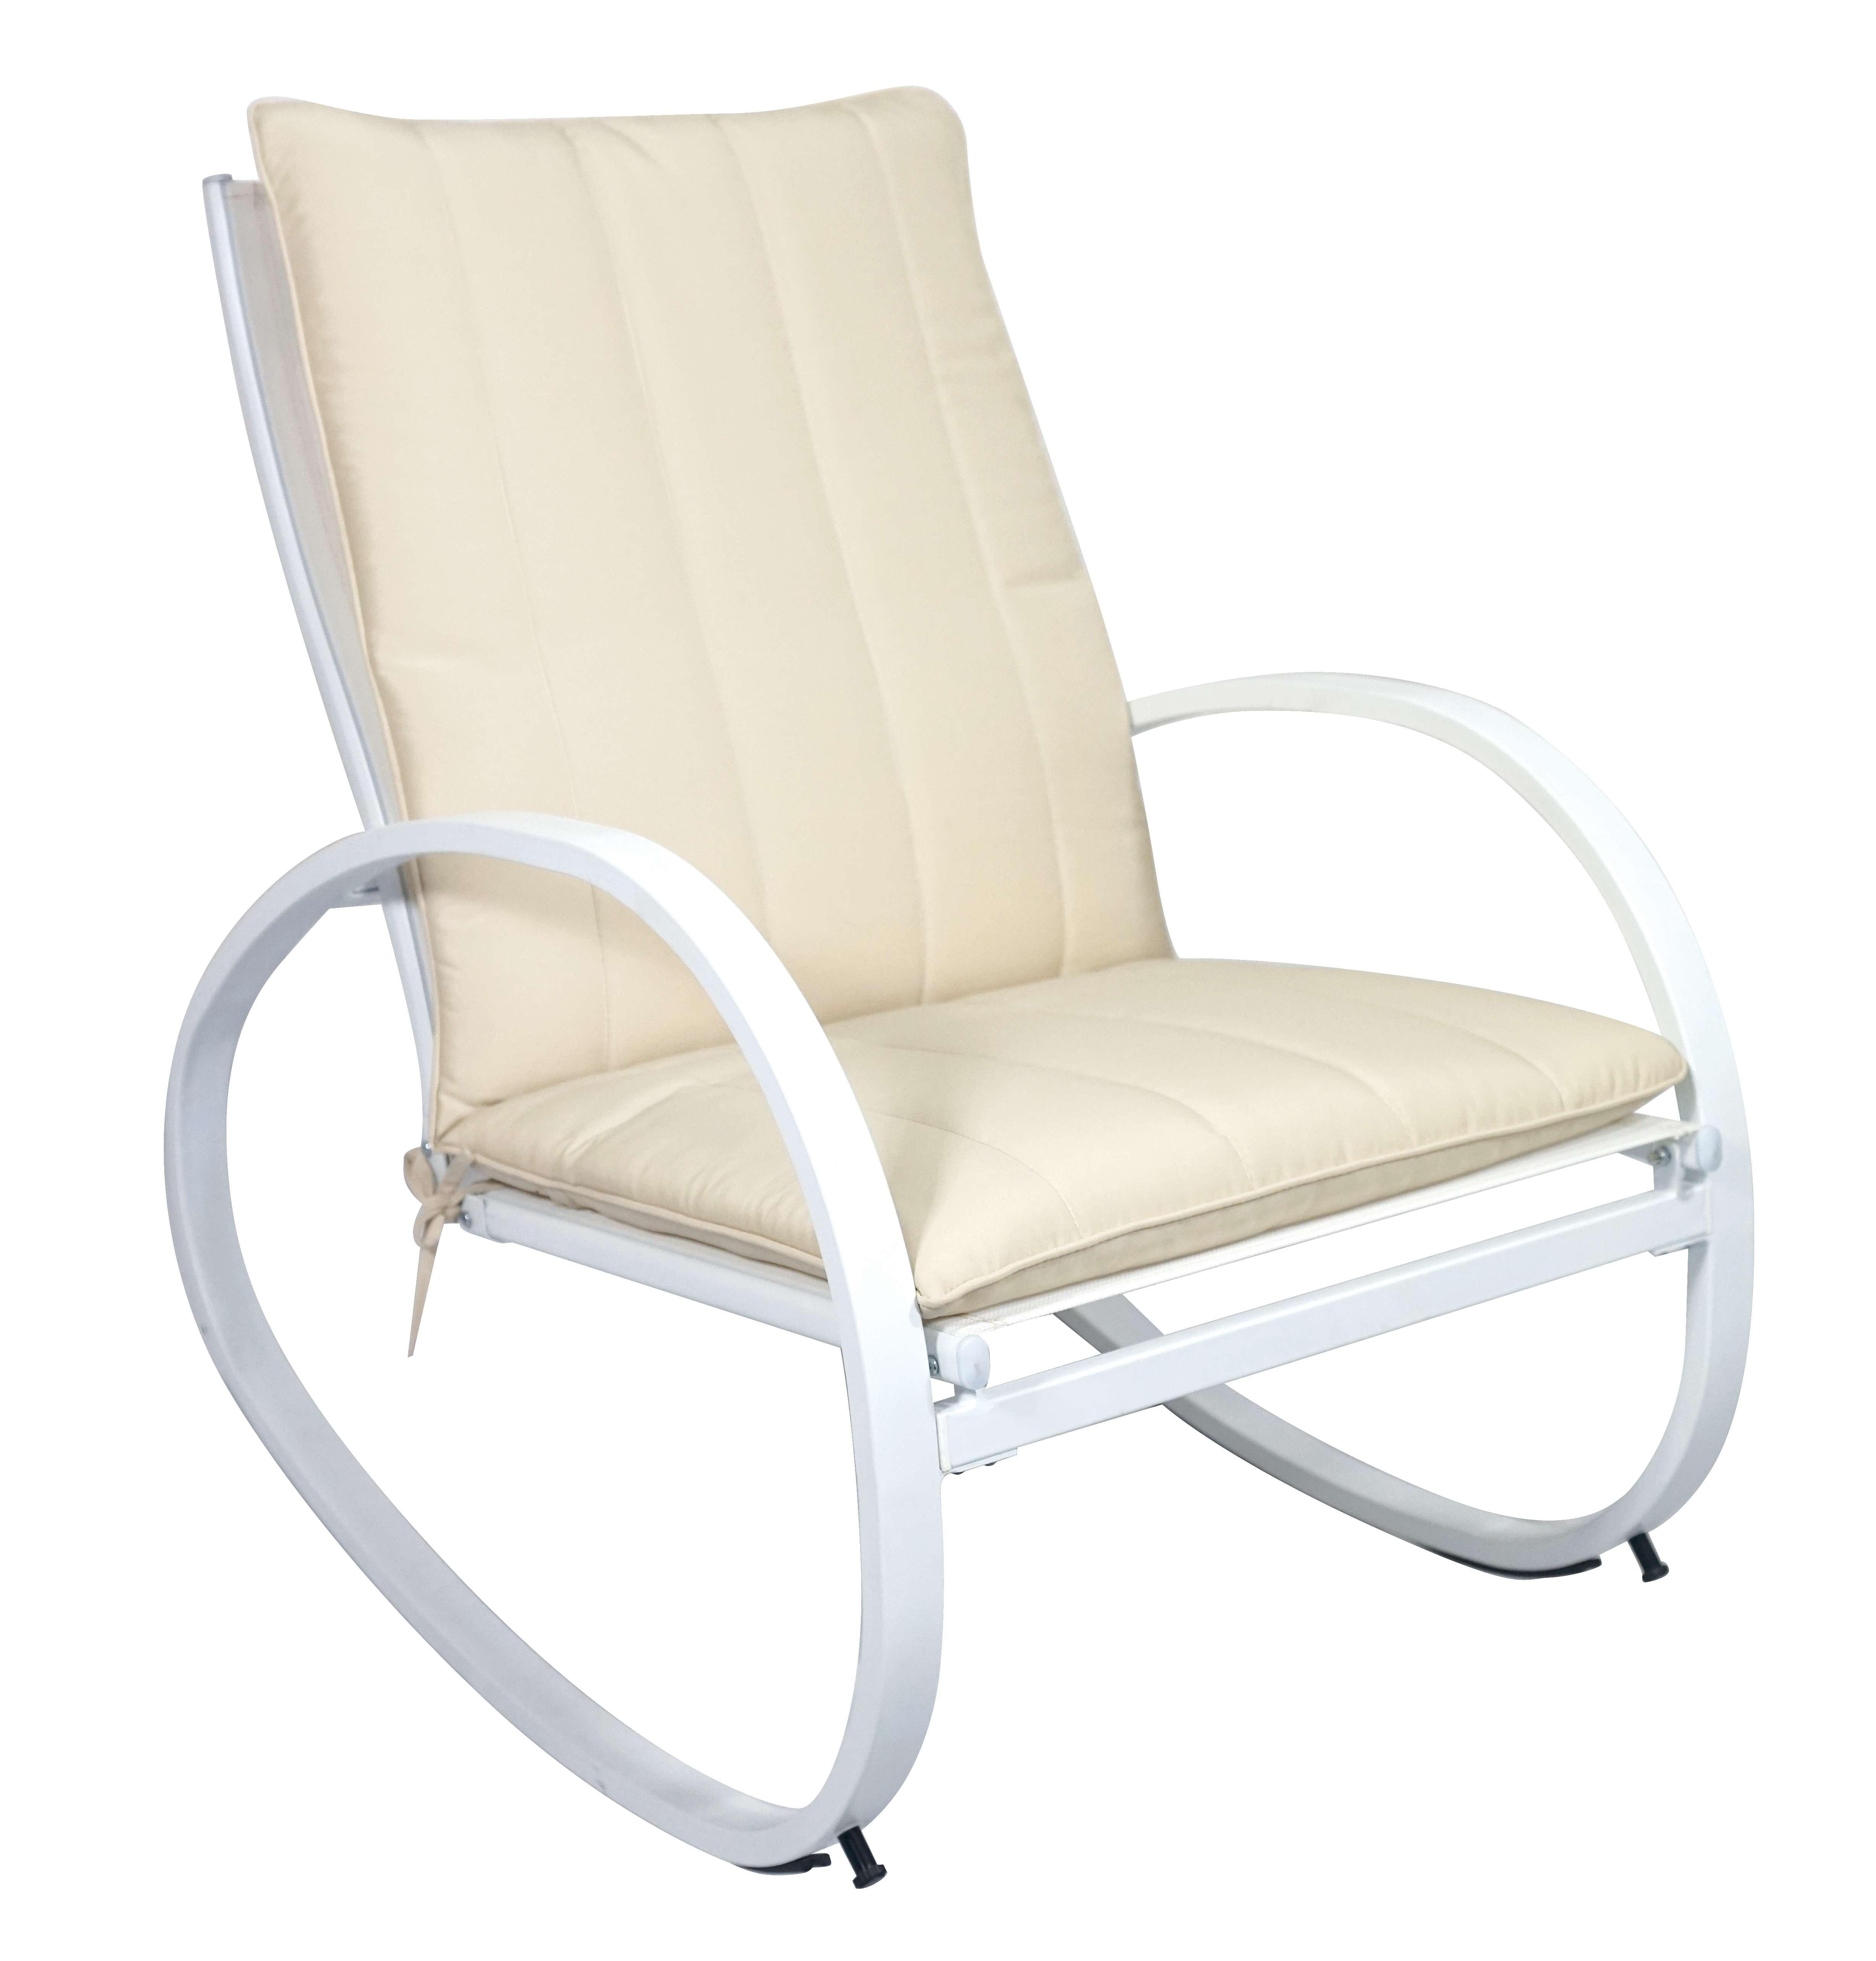 Sedia a dondolo greenwood mobili da giardino - Sedia a dondolo da giardino ...